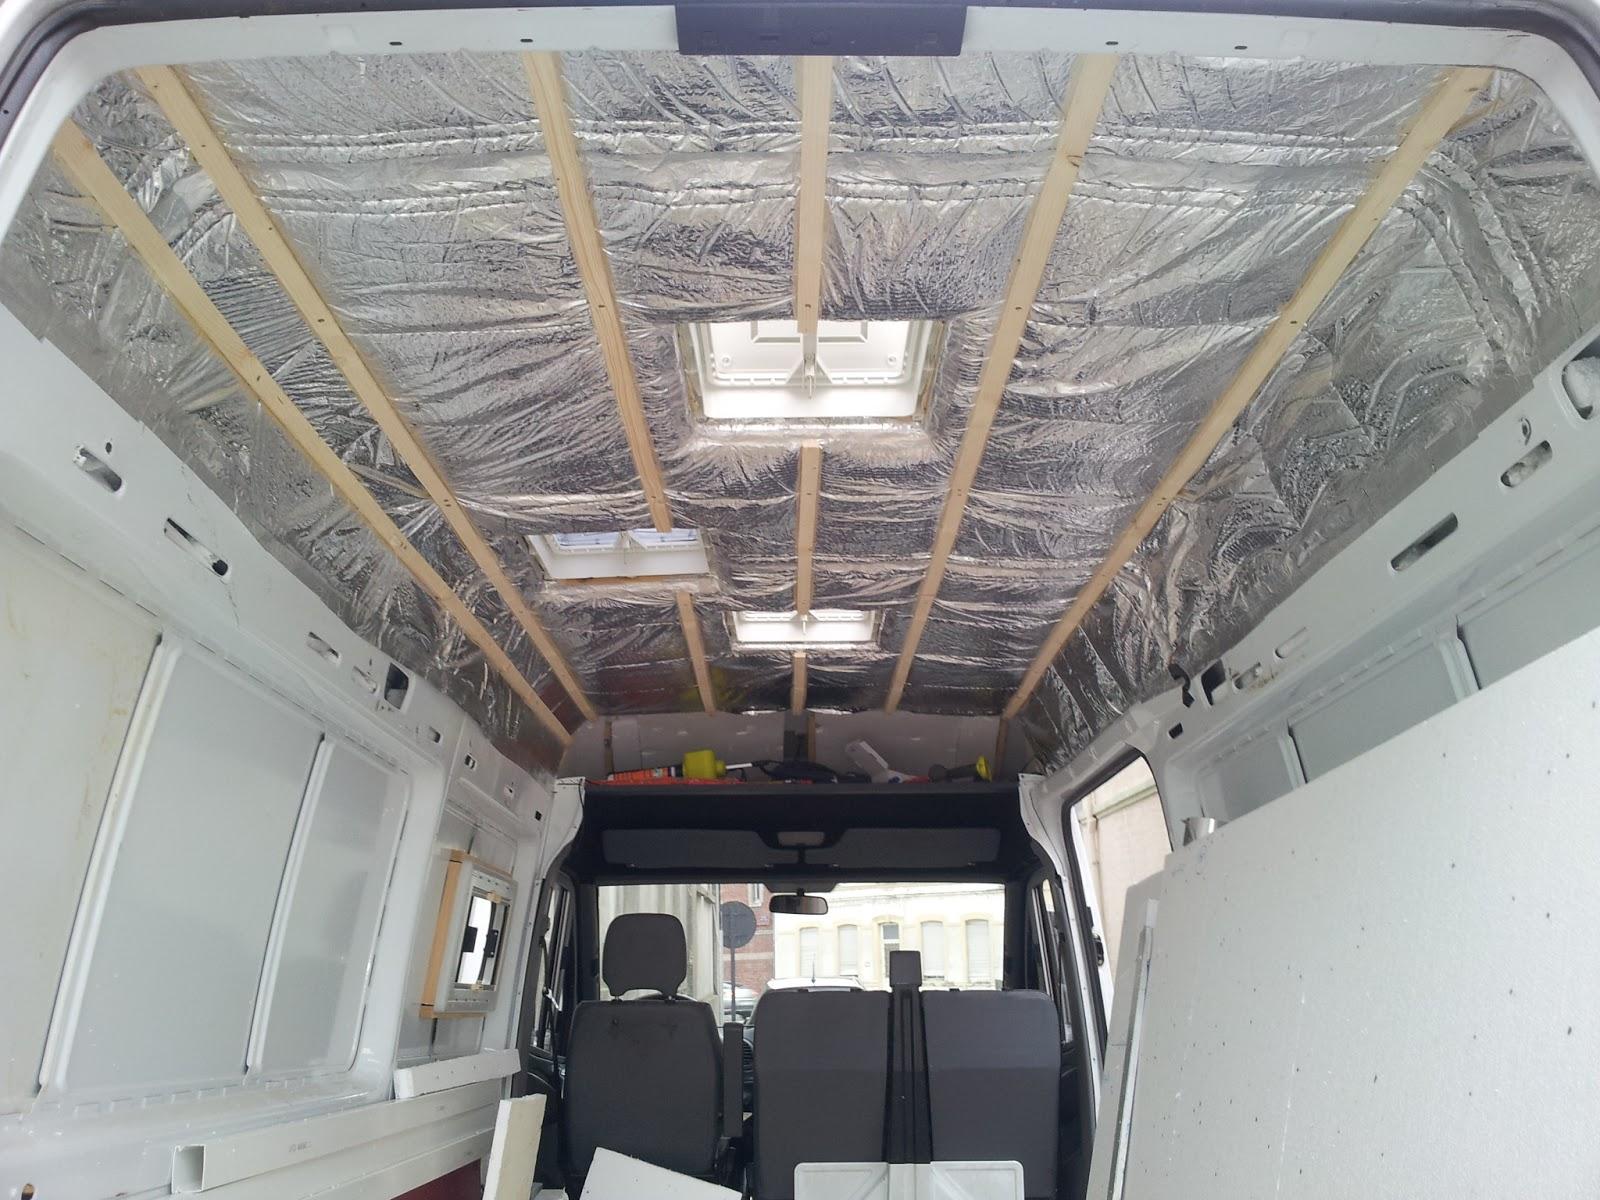 am nagement d 39 un sprinter en camping car isolation du toit. Black Bedroom Furniture Sets. Home Design Ideas